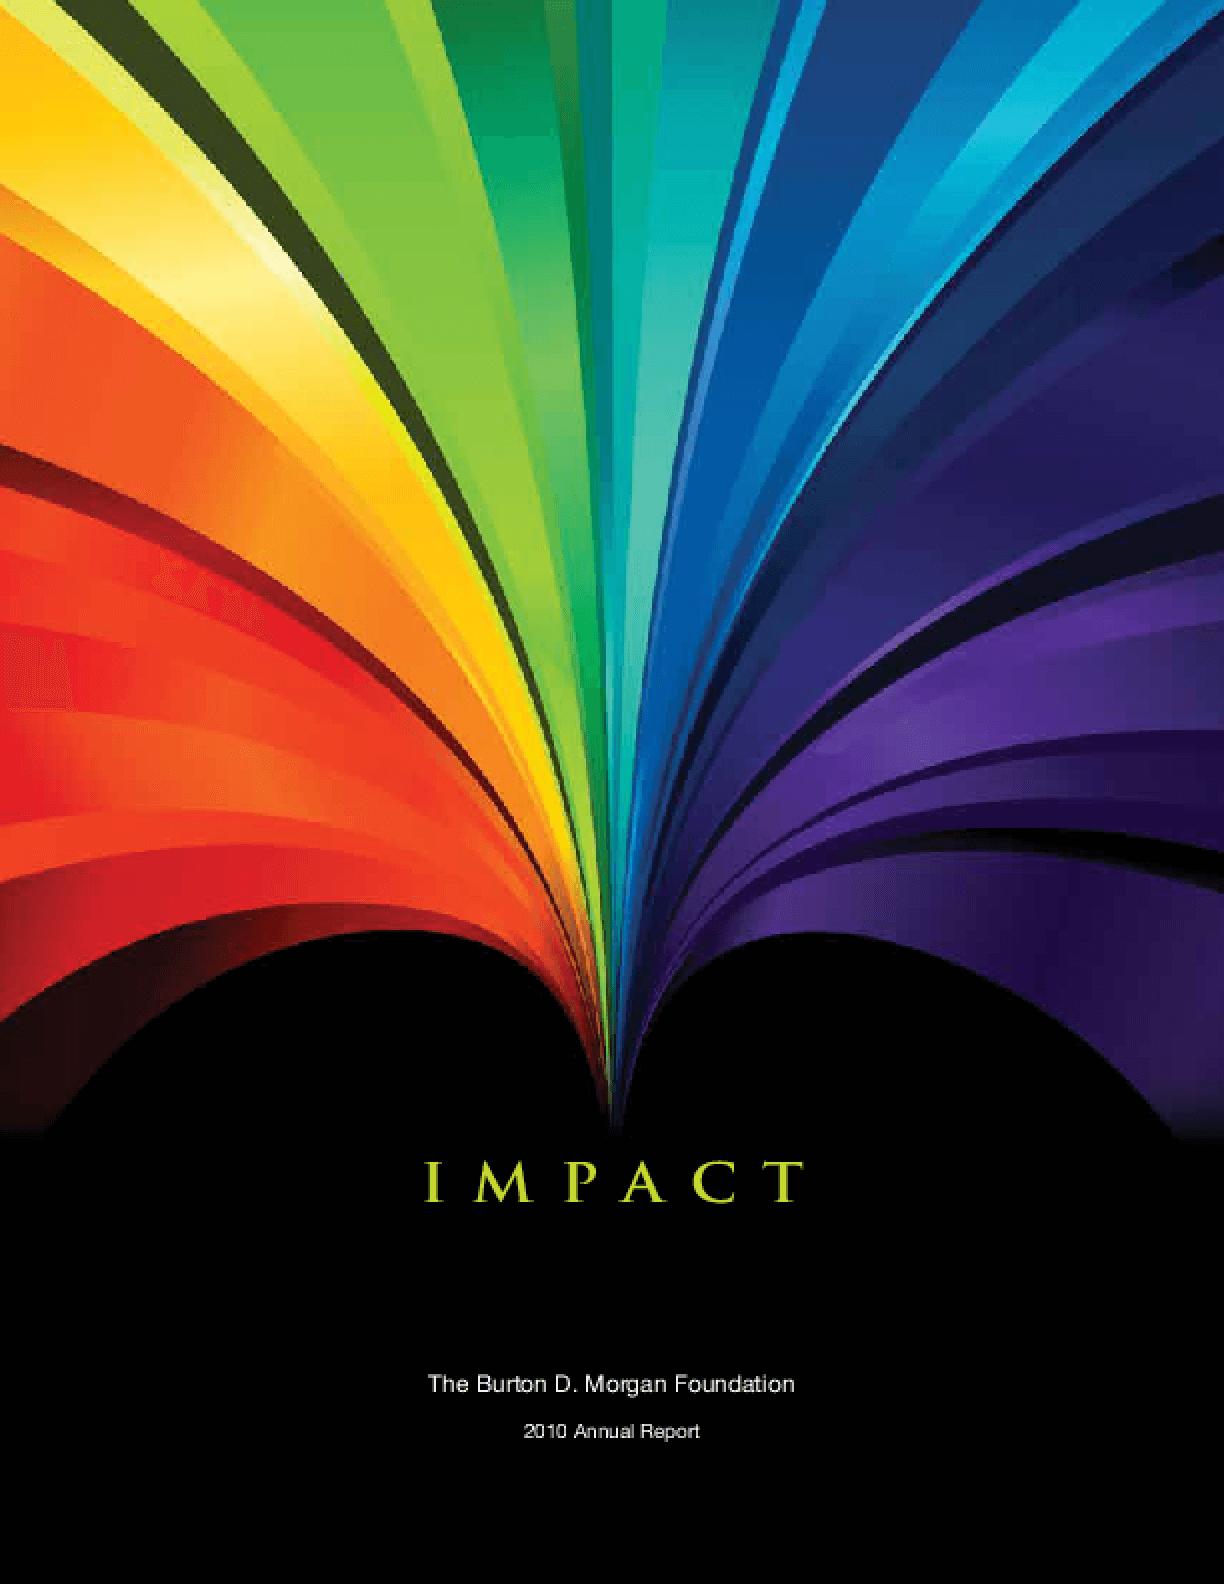 Impact: The Burton D. Morgan Foundation 2010 Annual Report